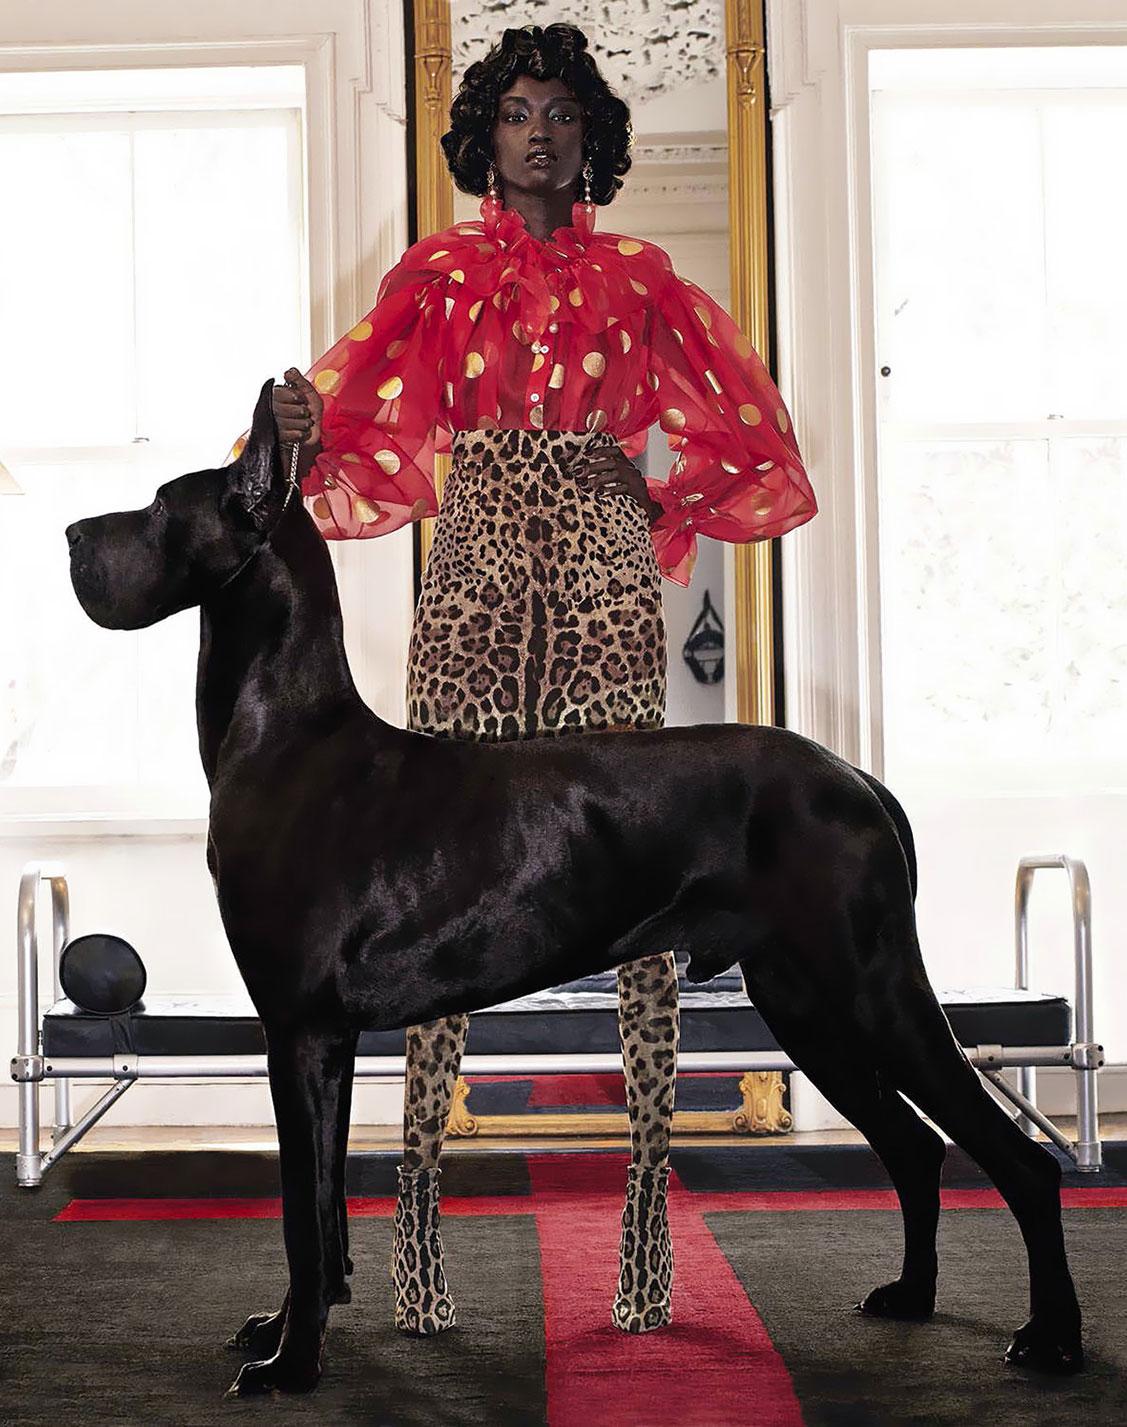 Черная дама с большой собачкой / Anok Yai by Steven Klein